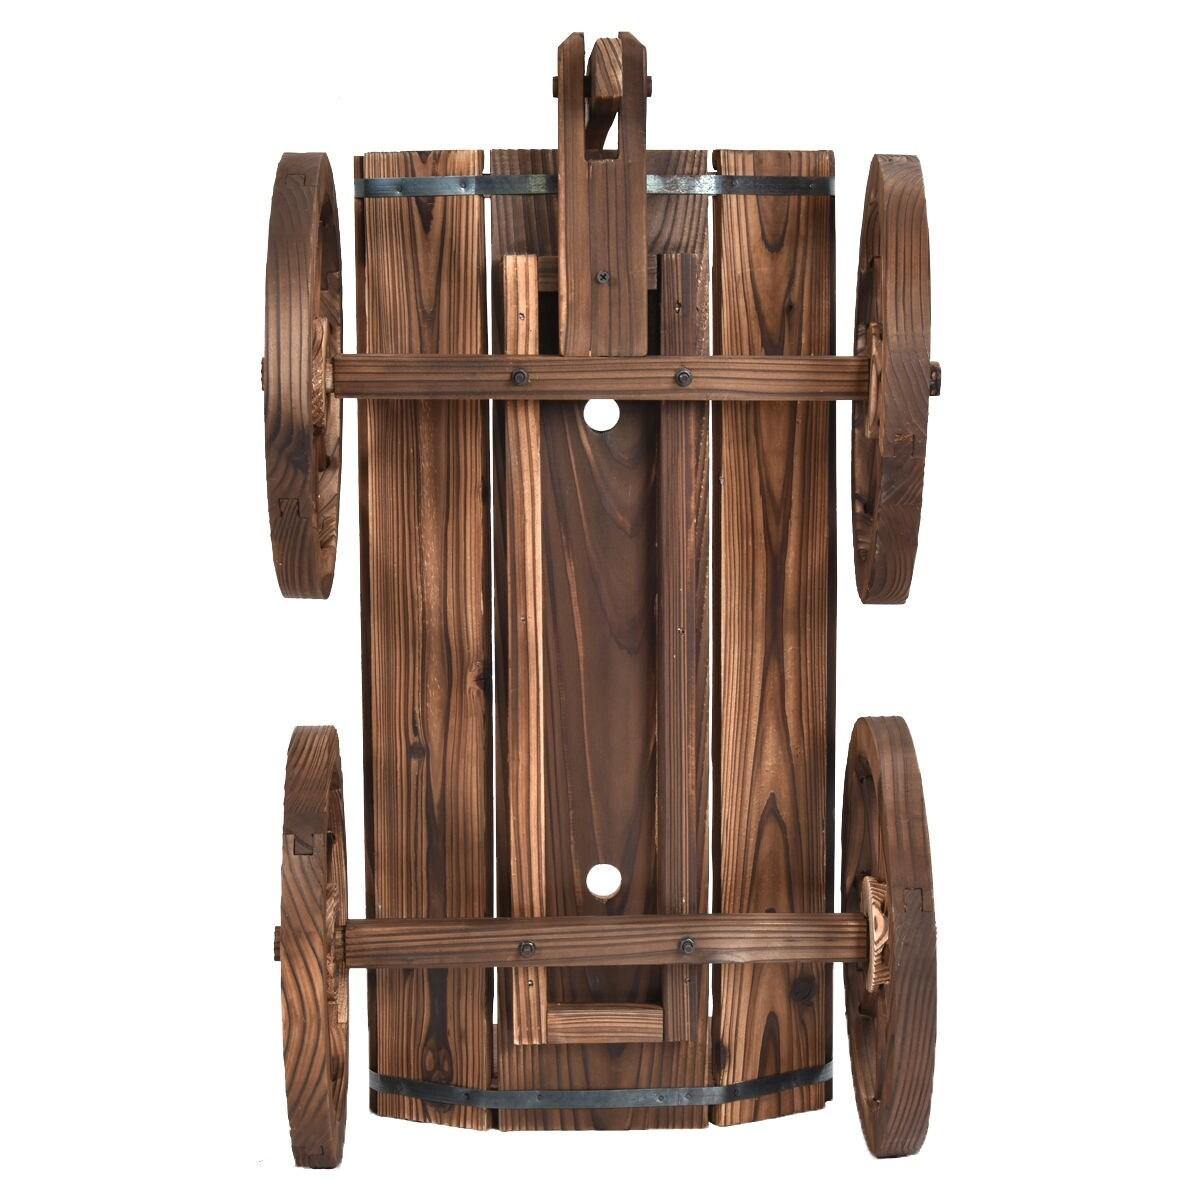 Shop Costway Wood Wagon Flower Planter Pot Stand W/Wheels Home ...